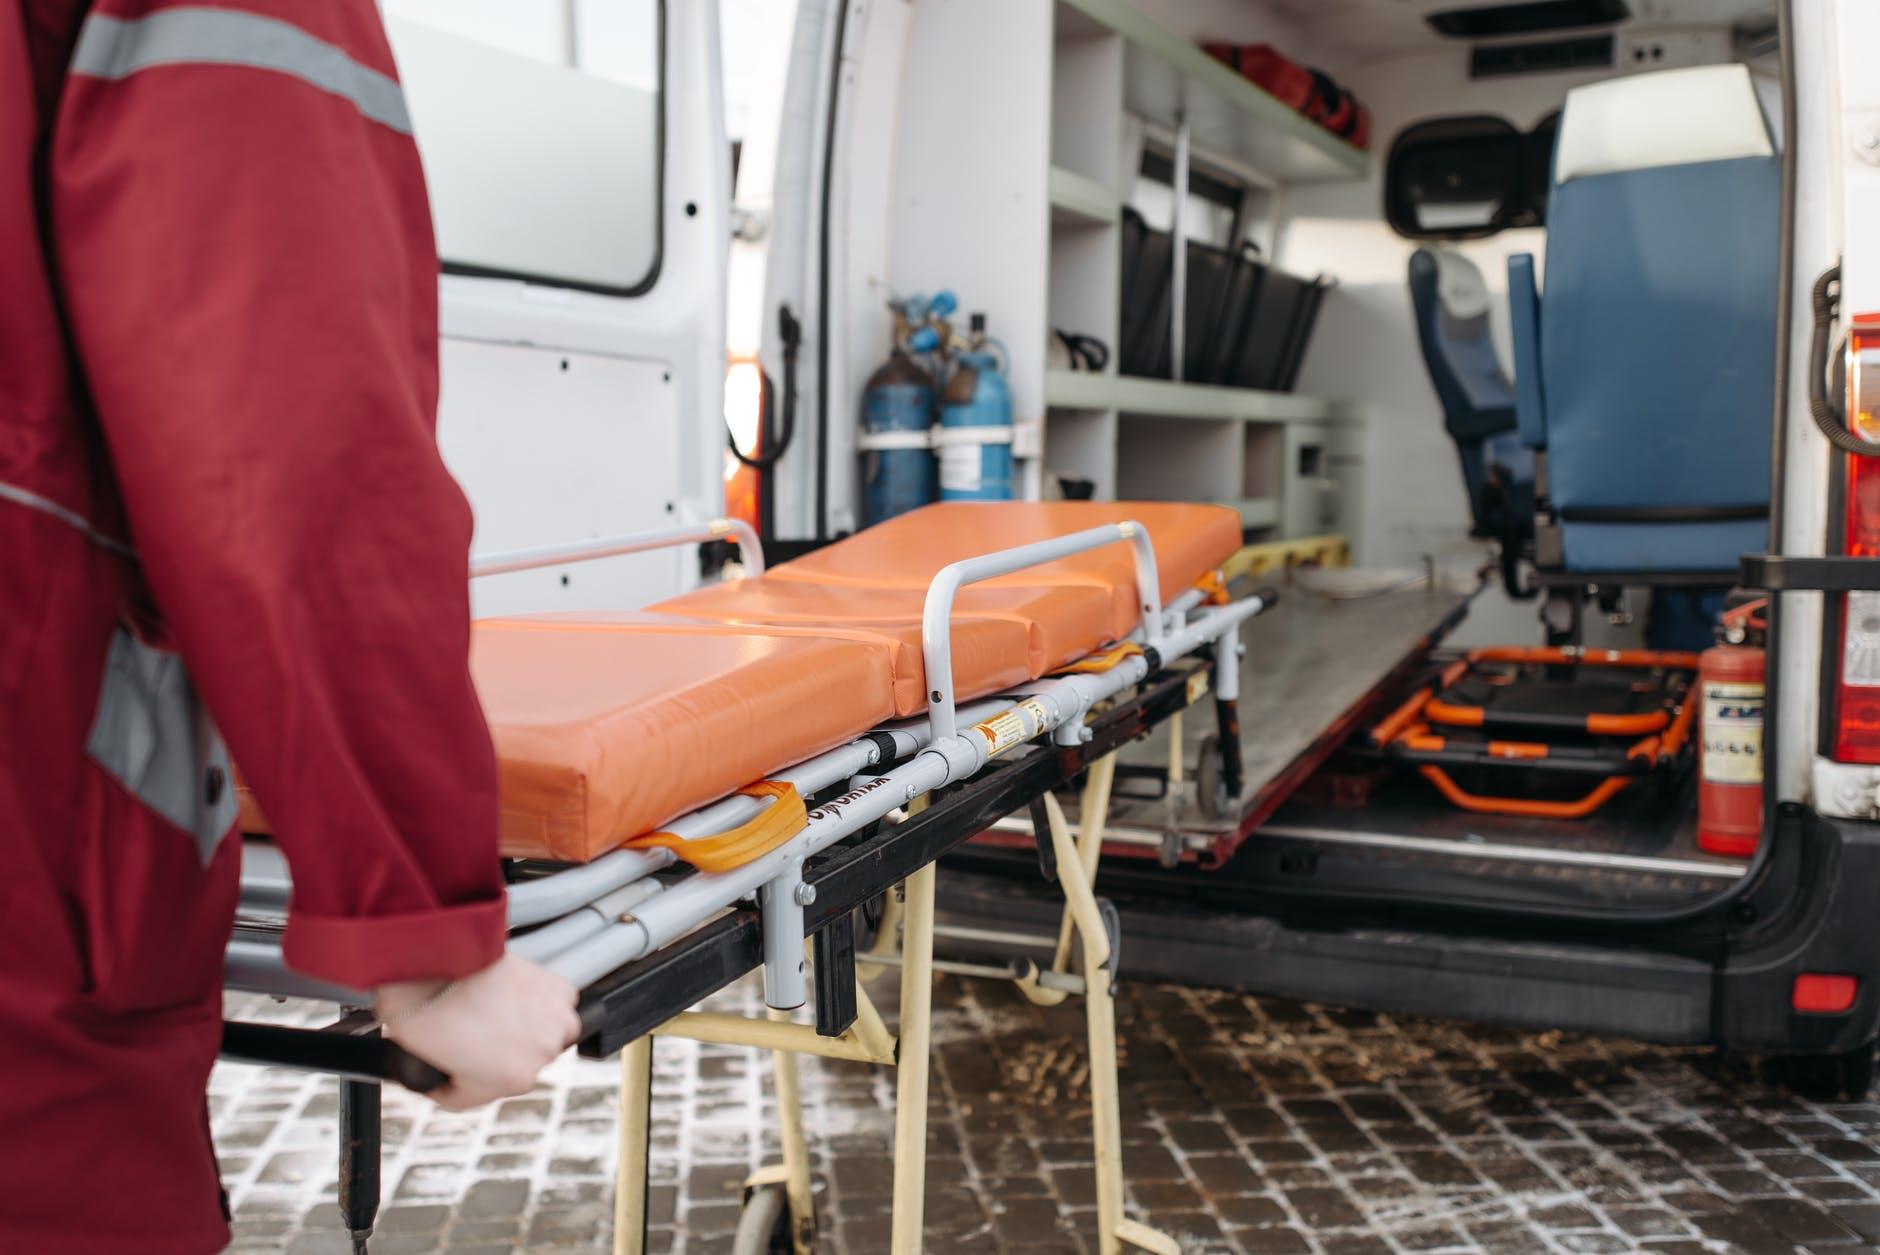 man pushing a stretcher